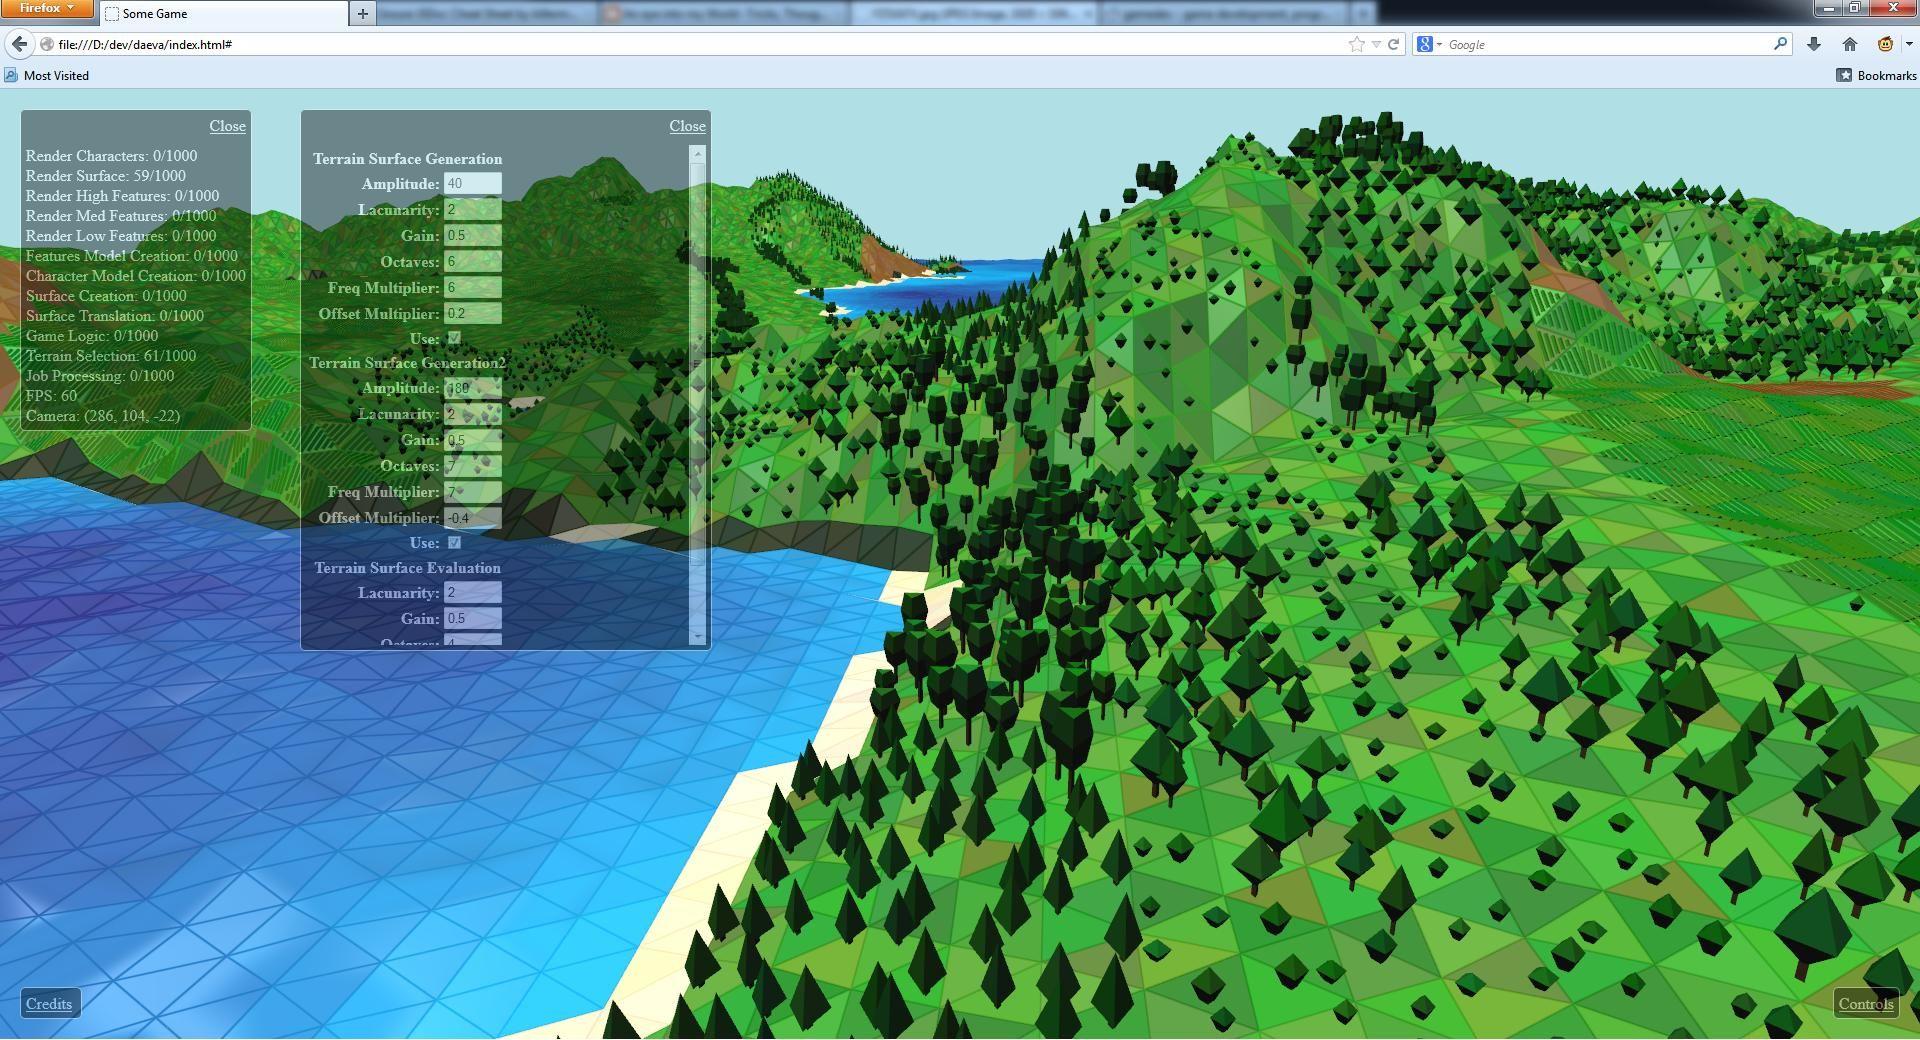 Pin by roman ilyin on ui maps leveldesign social casual unity ui gumiabroncs Choice Image